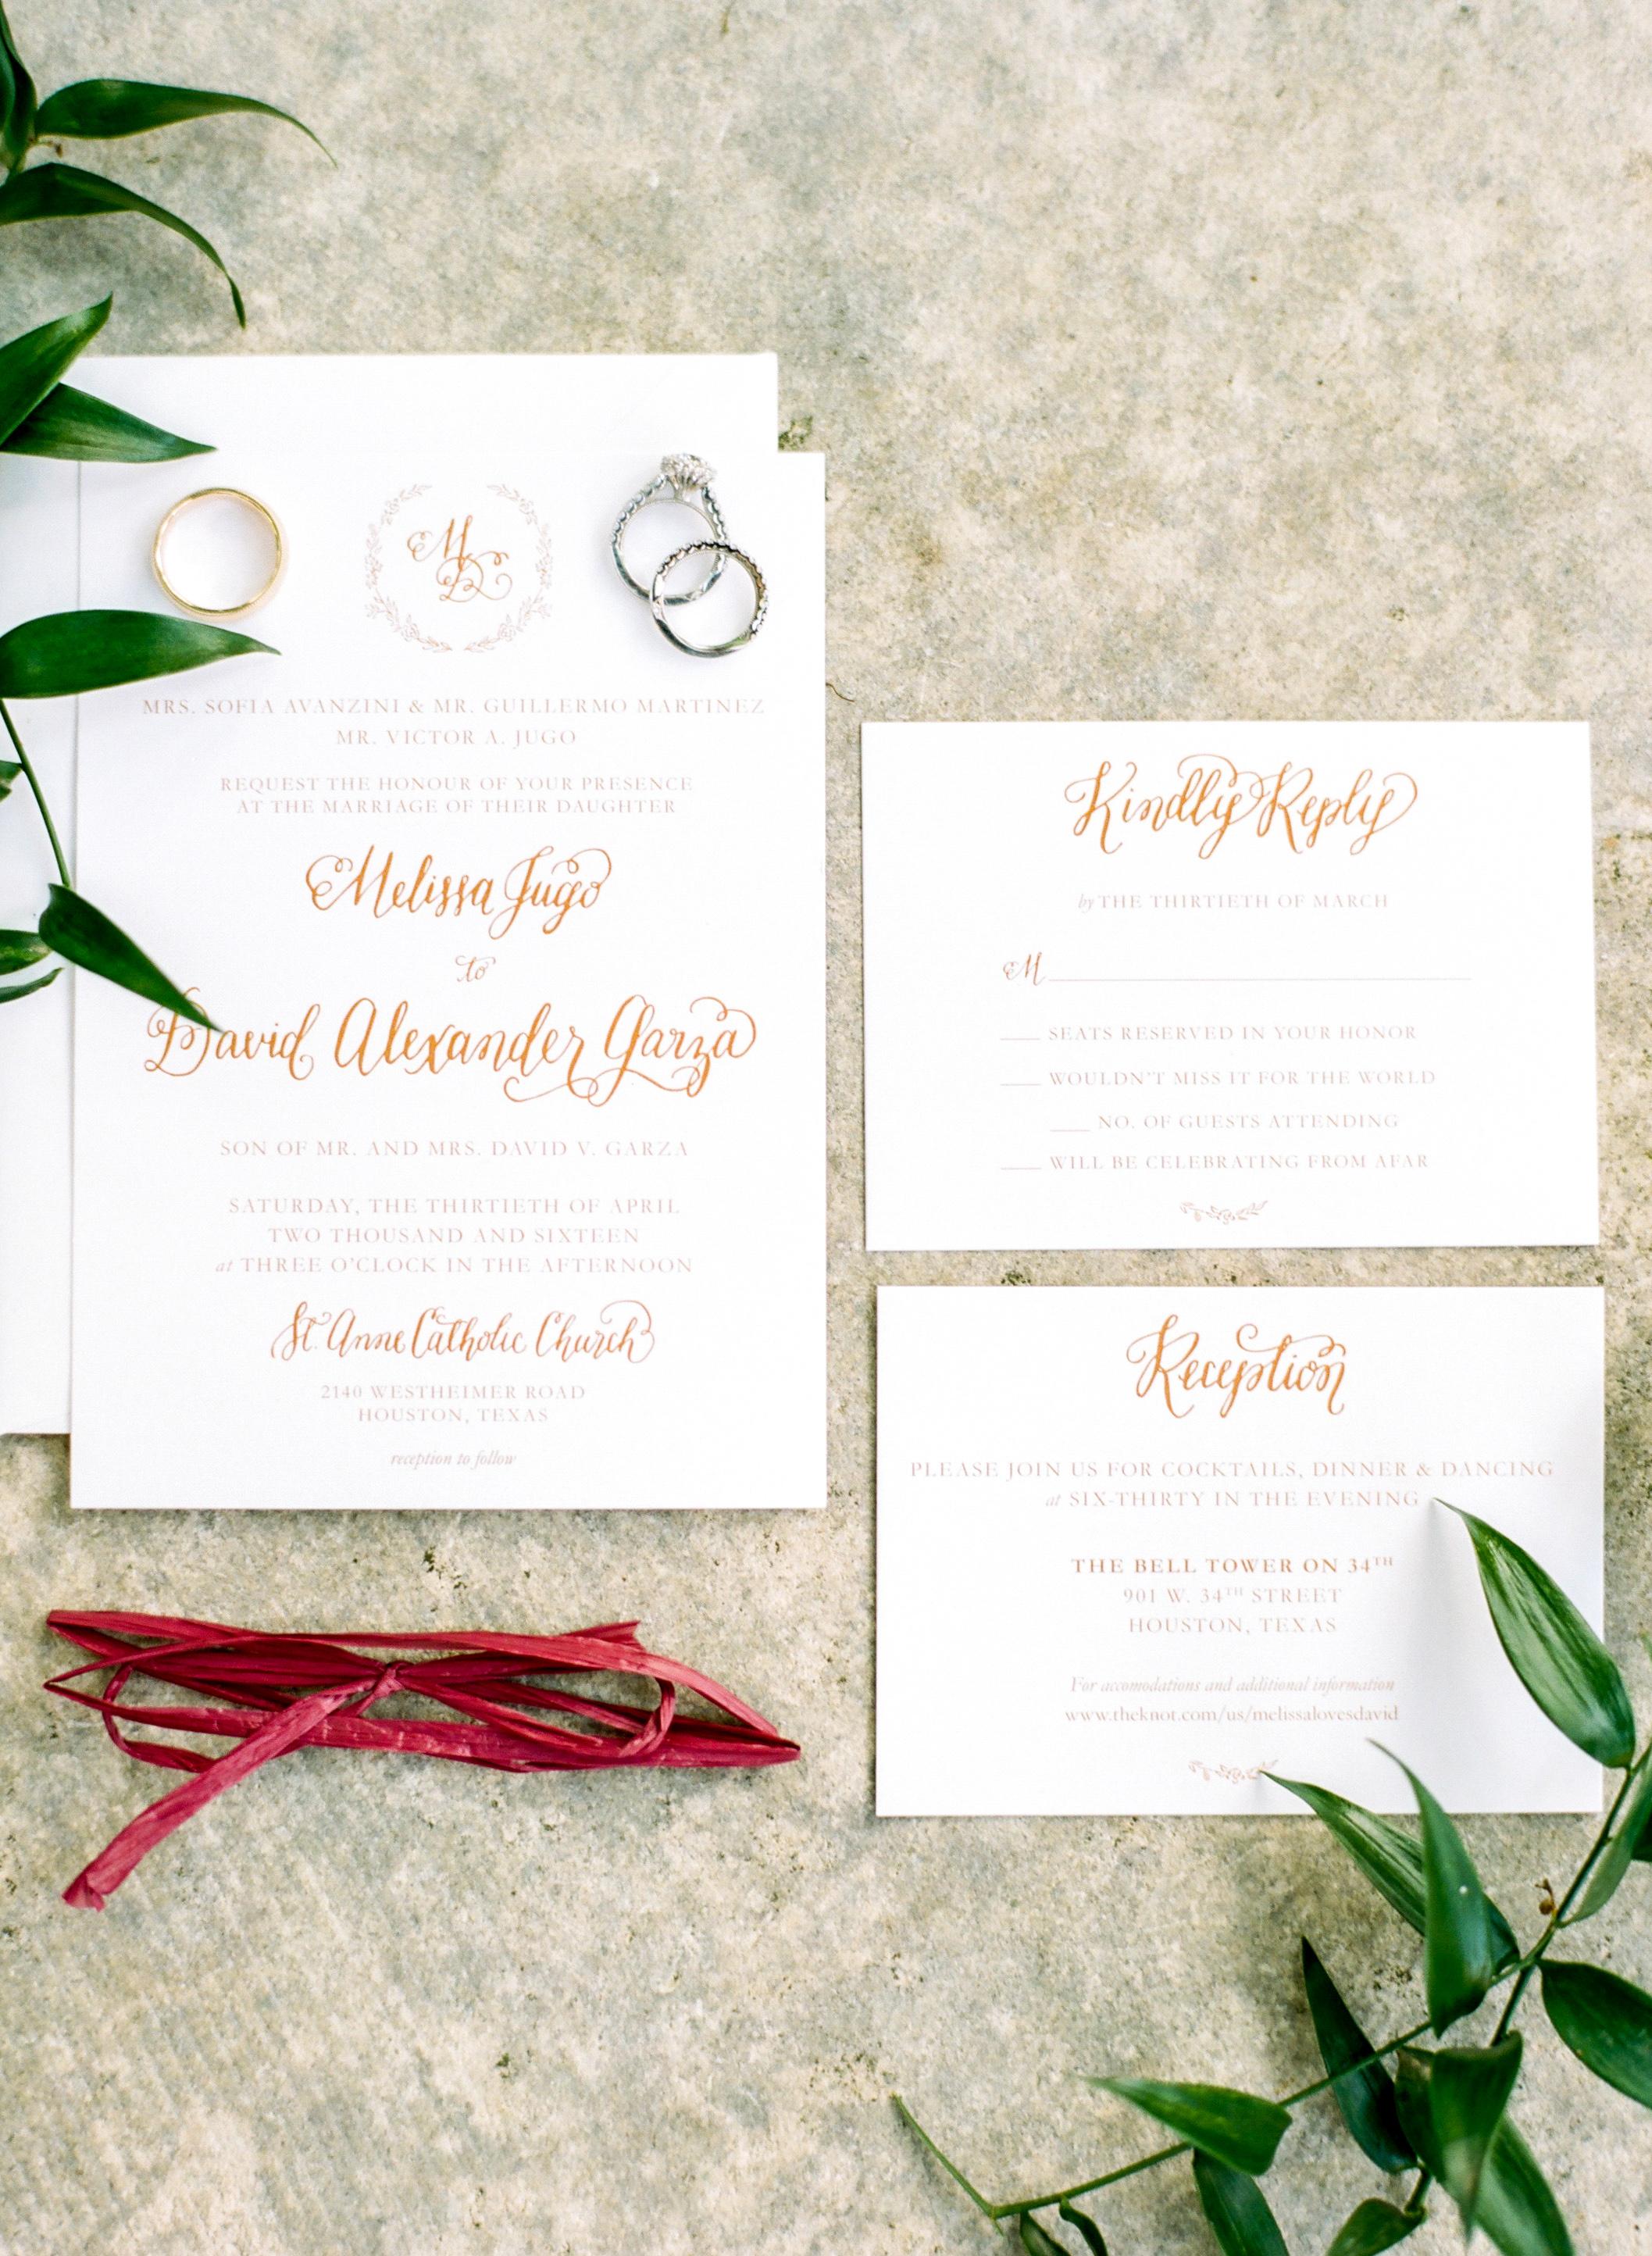 Houston-Wedding-Photography-St.-Anne-Catholic-Church-Houston-Wedding-The-Bell-Tower-on-34th-reception-wedding-film-1.jpg